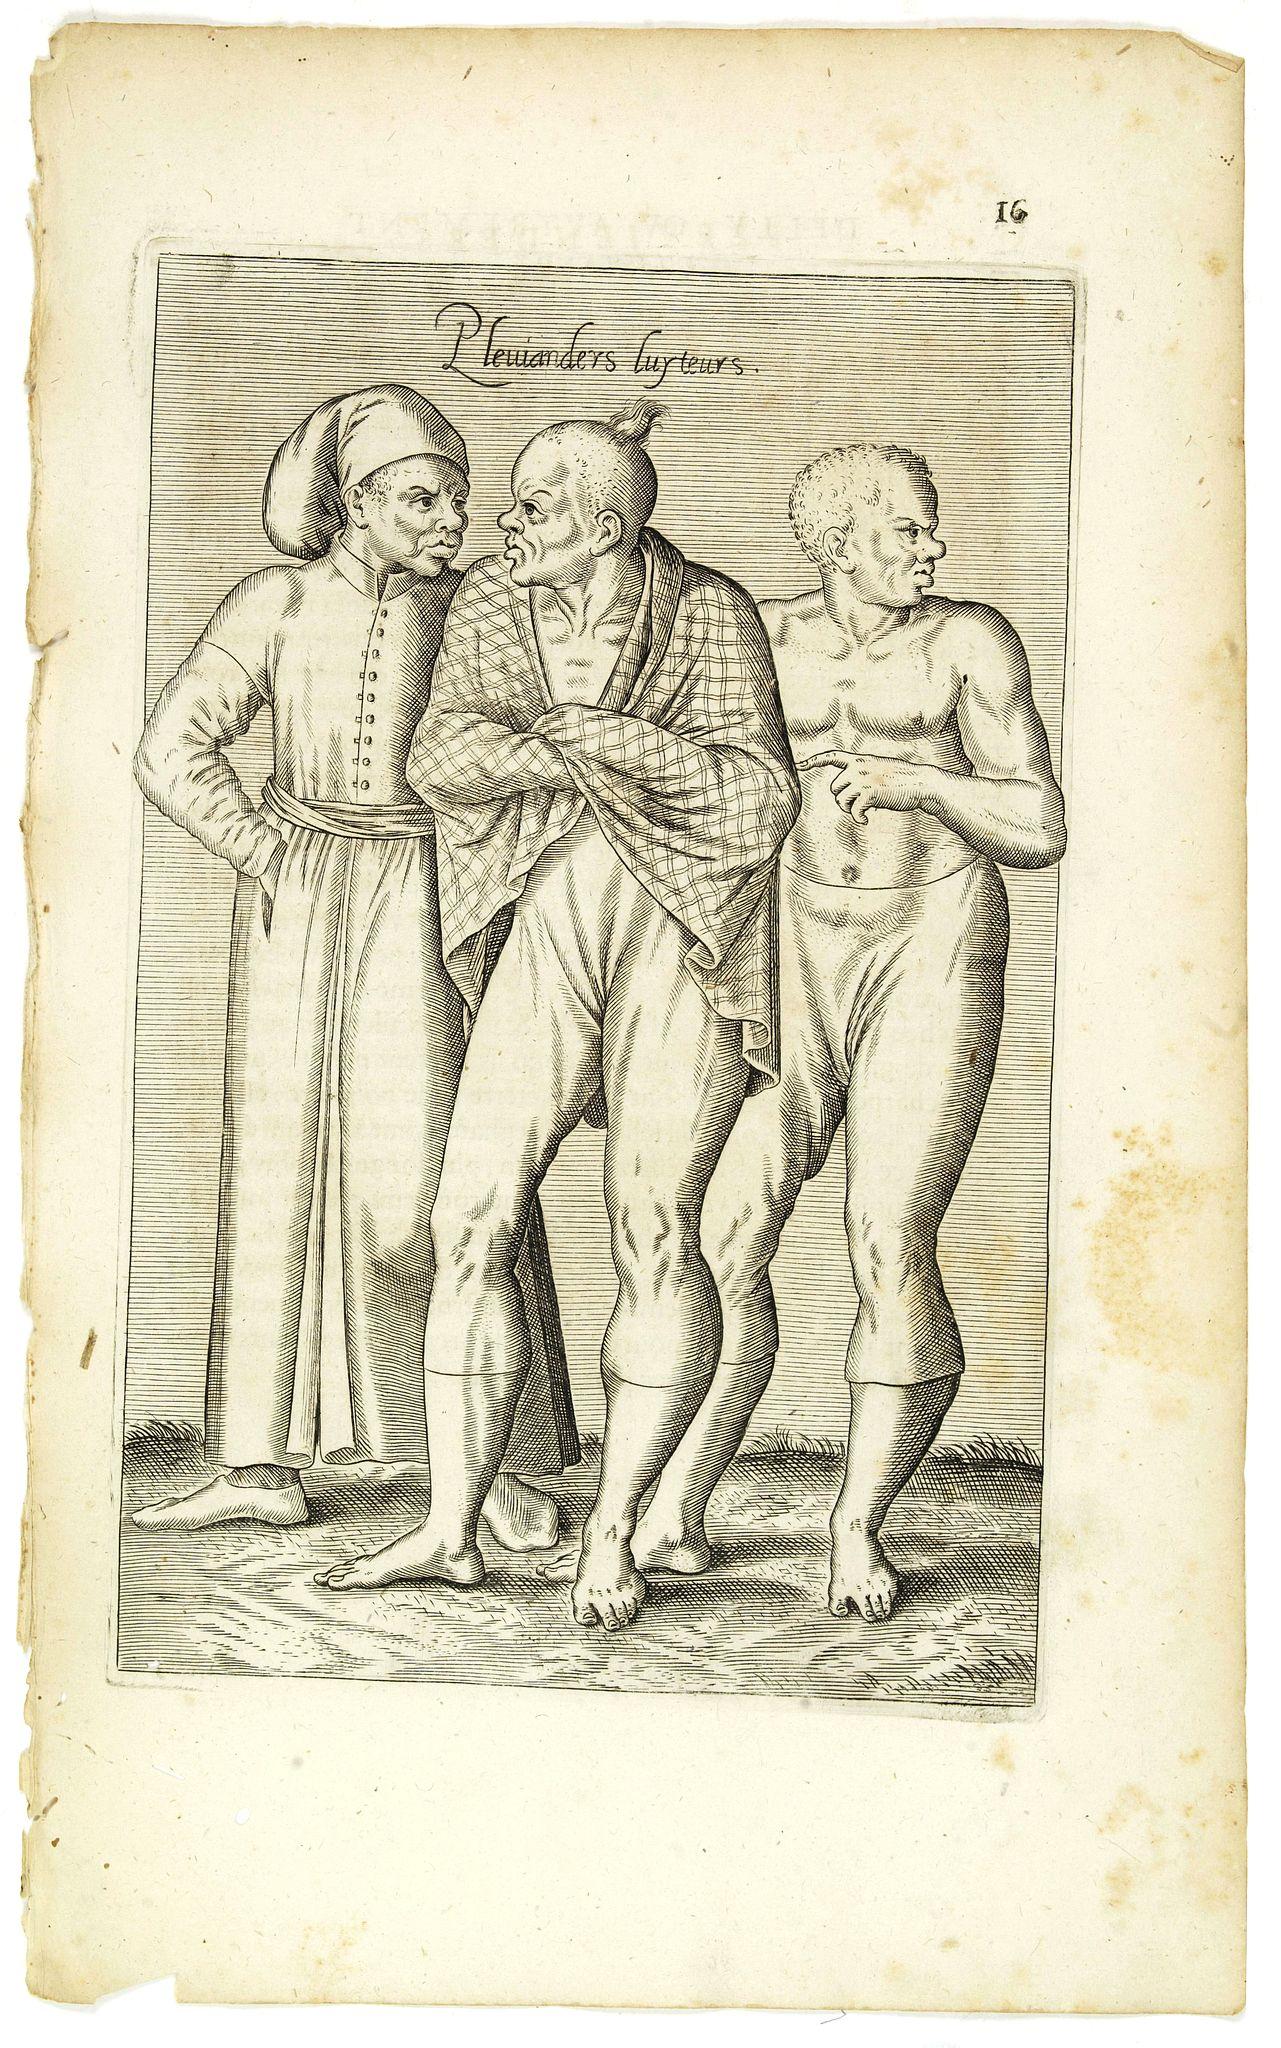 NICOLAS DE NICOLAY, Thomas Artus (sieur d'Embry). -  Pleuianders Luyteurs. (16)